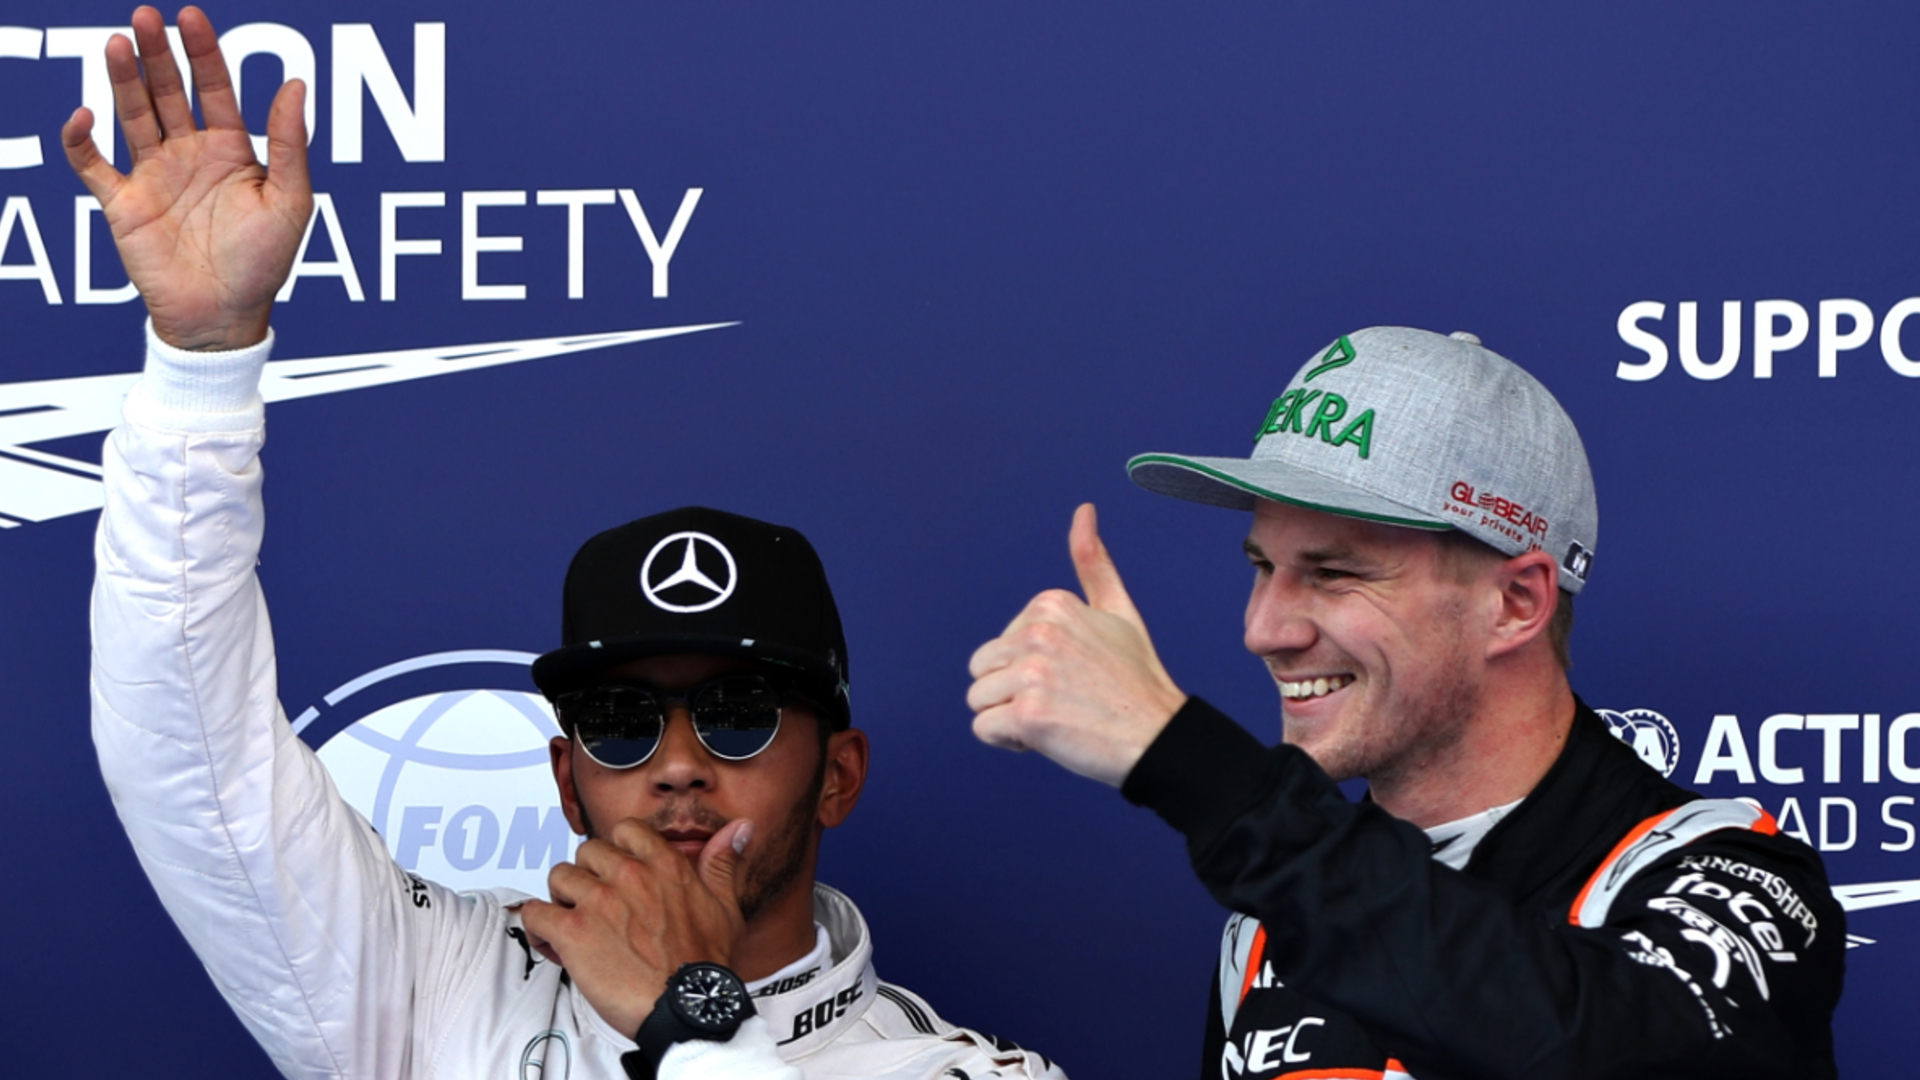 Hulkenberg thinks Hamilton crash changed 'trajectory' of F1 career